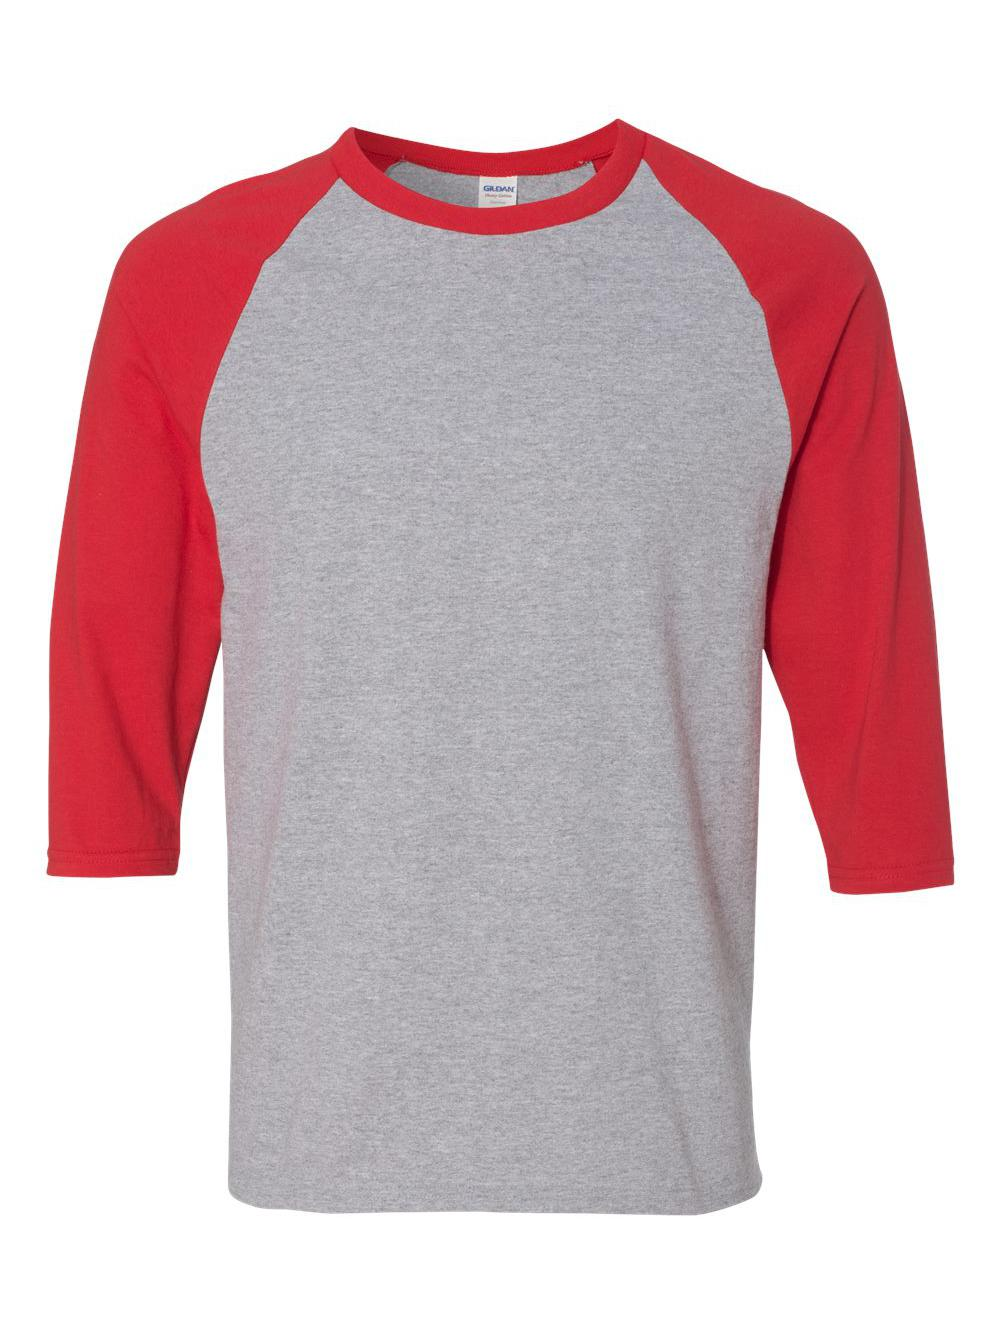 Gildan-Heavy-Cotton-Three-Quarter-Raglan-Sleeve-Baseball-T-Shirt-5700 thumbnail 12